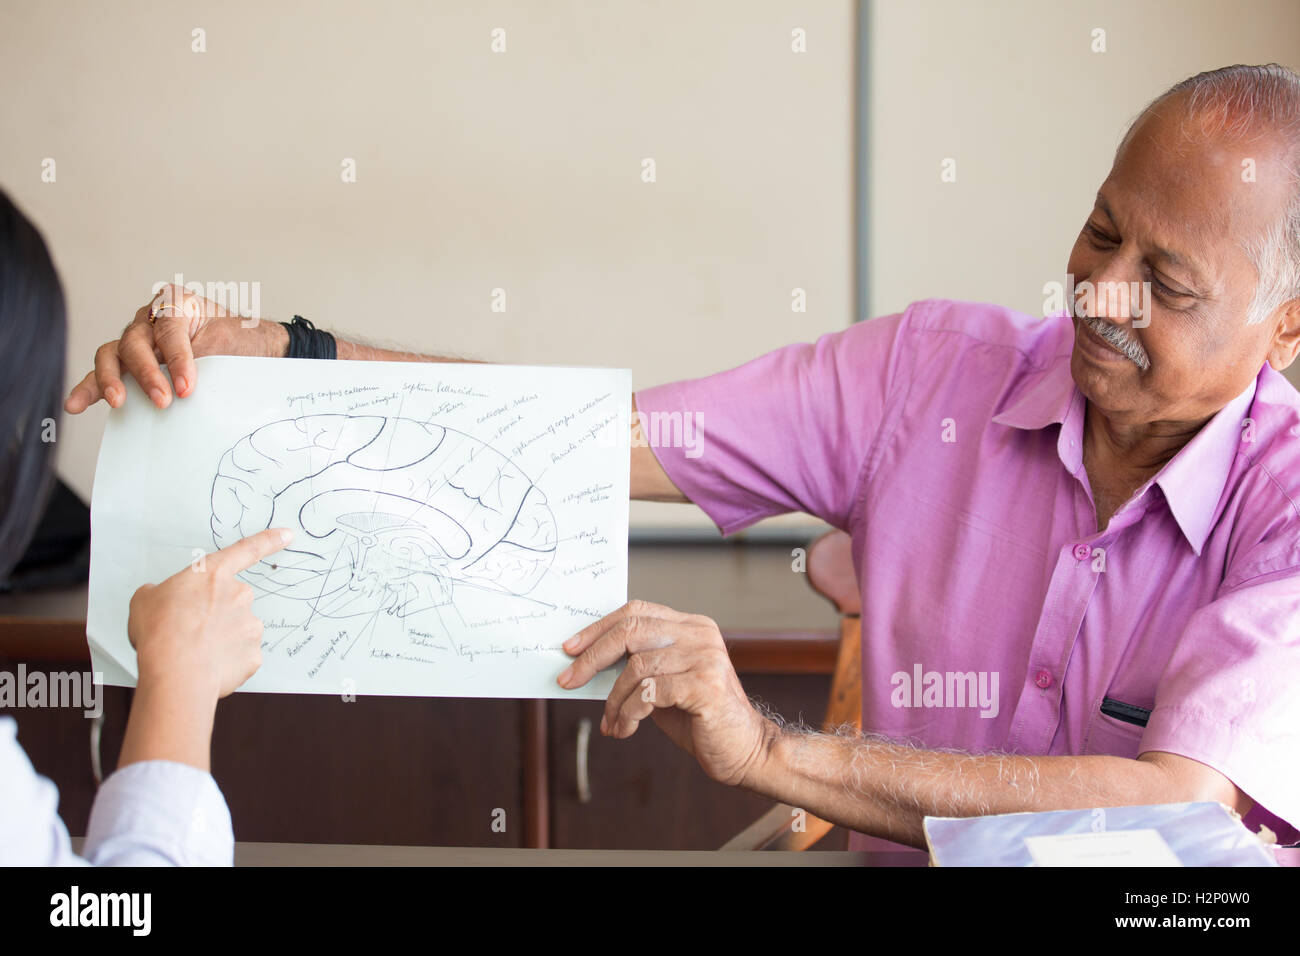 Professor In Anatomy Lecture Stockfotos & Professor In Anatomy ...